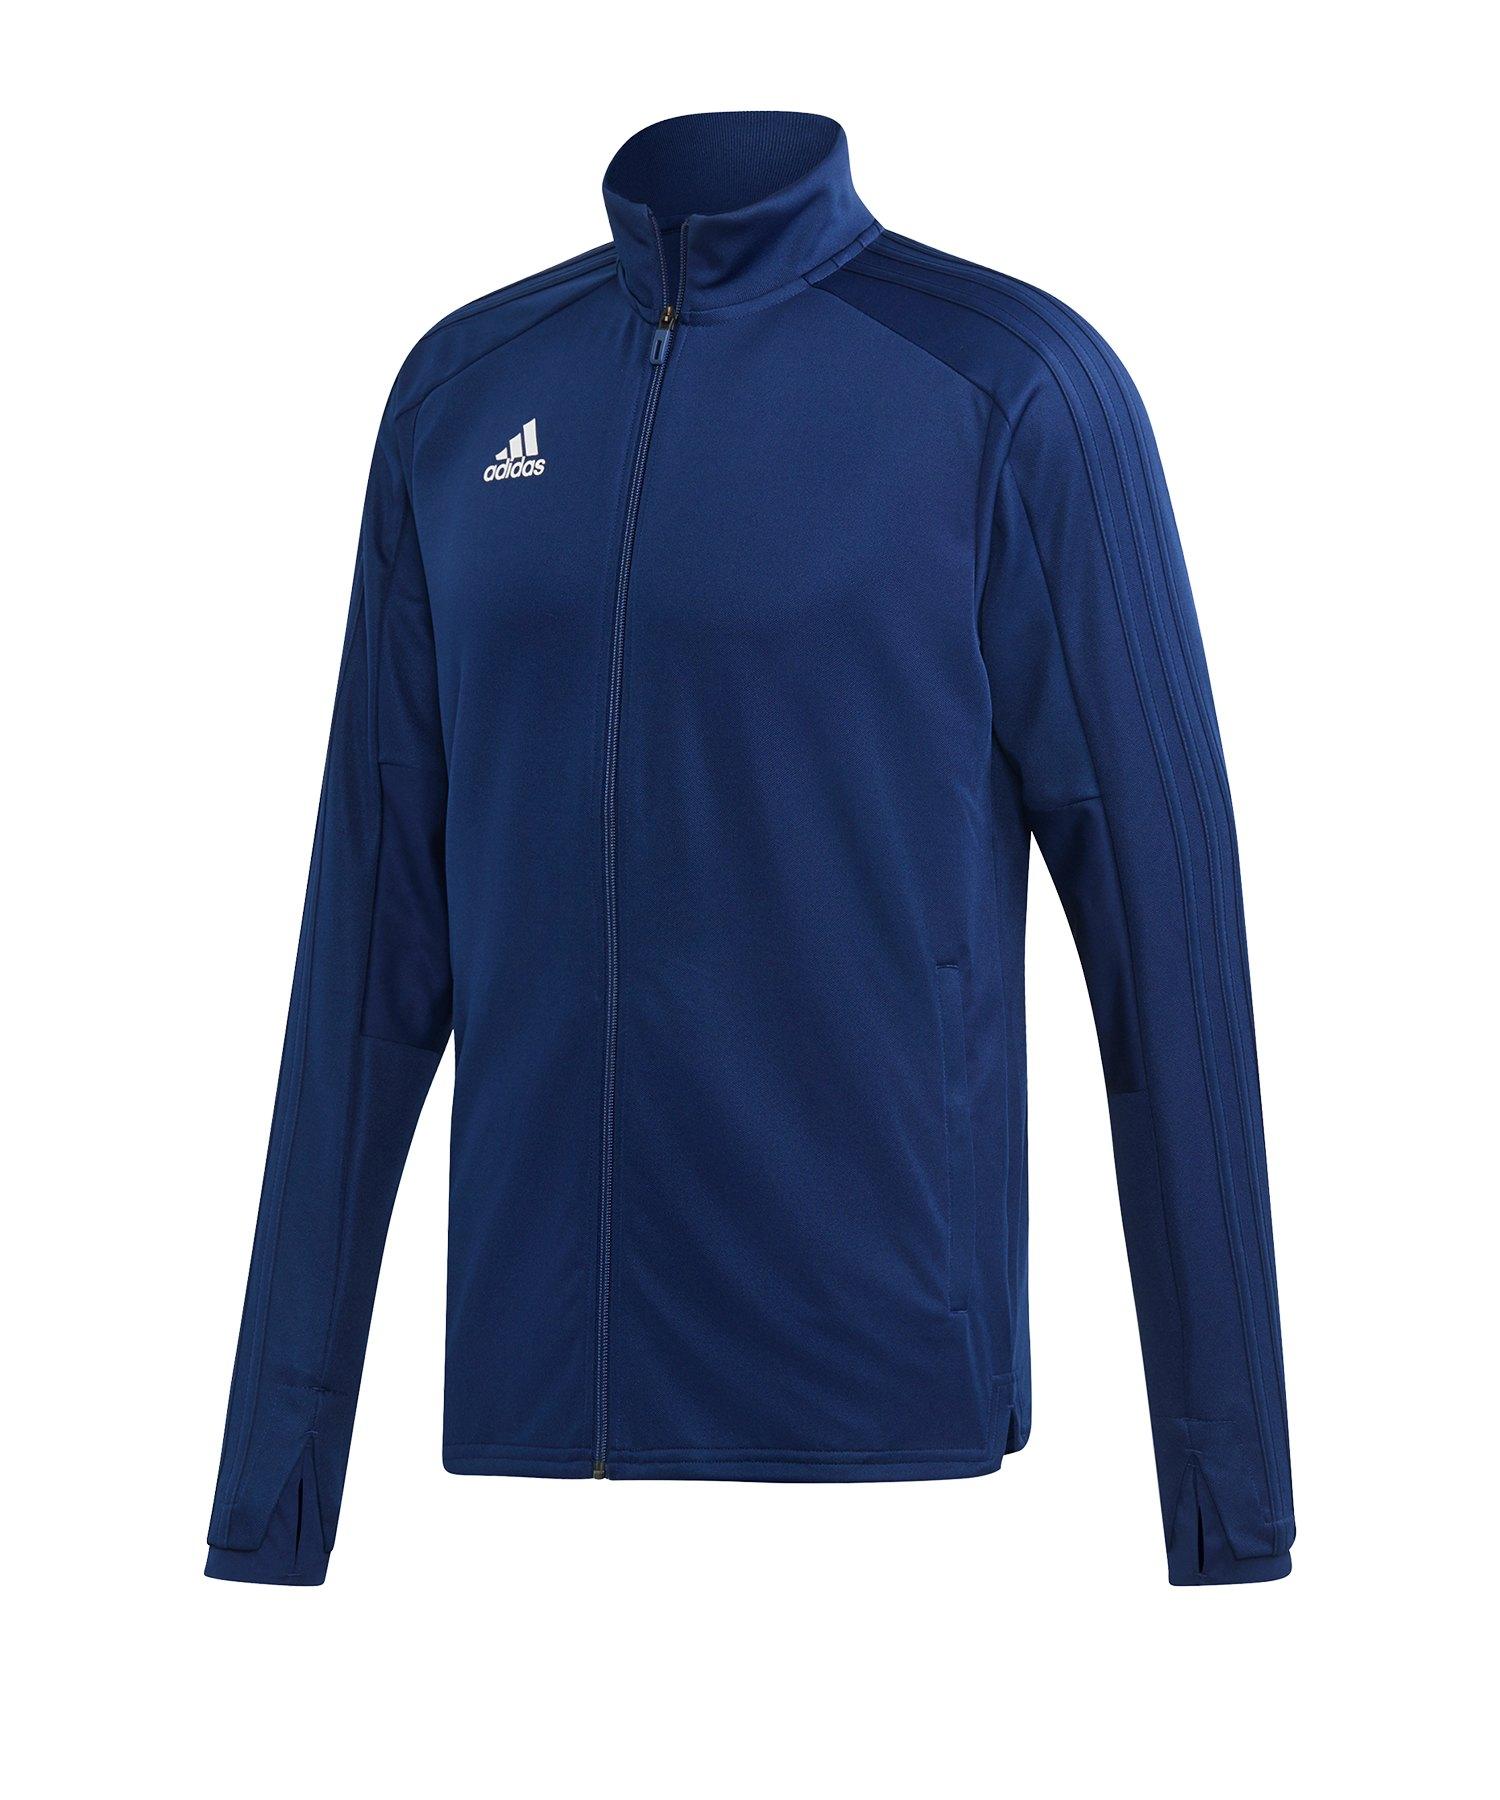 adidas Condivo 18 Trainingsjacke Dunkelblau Weiss - blau